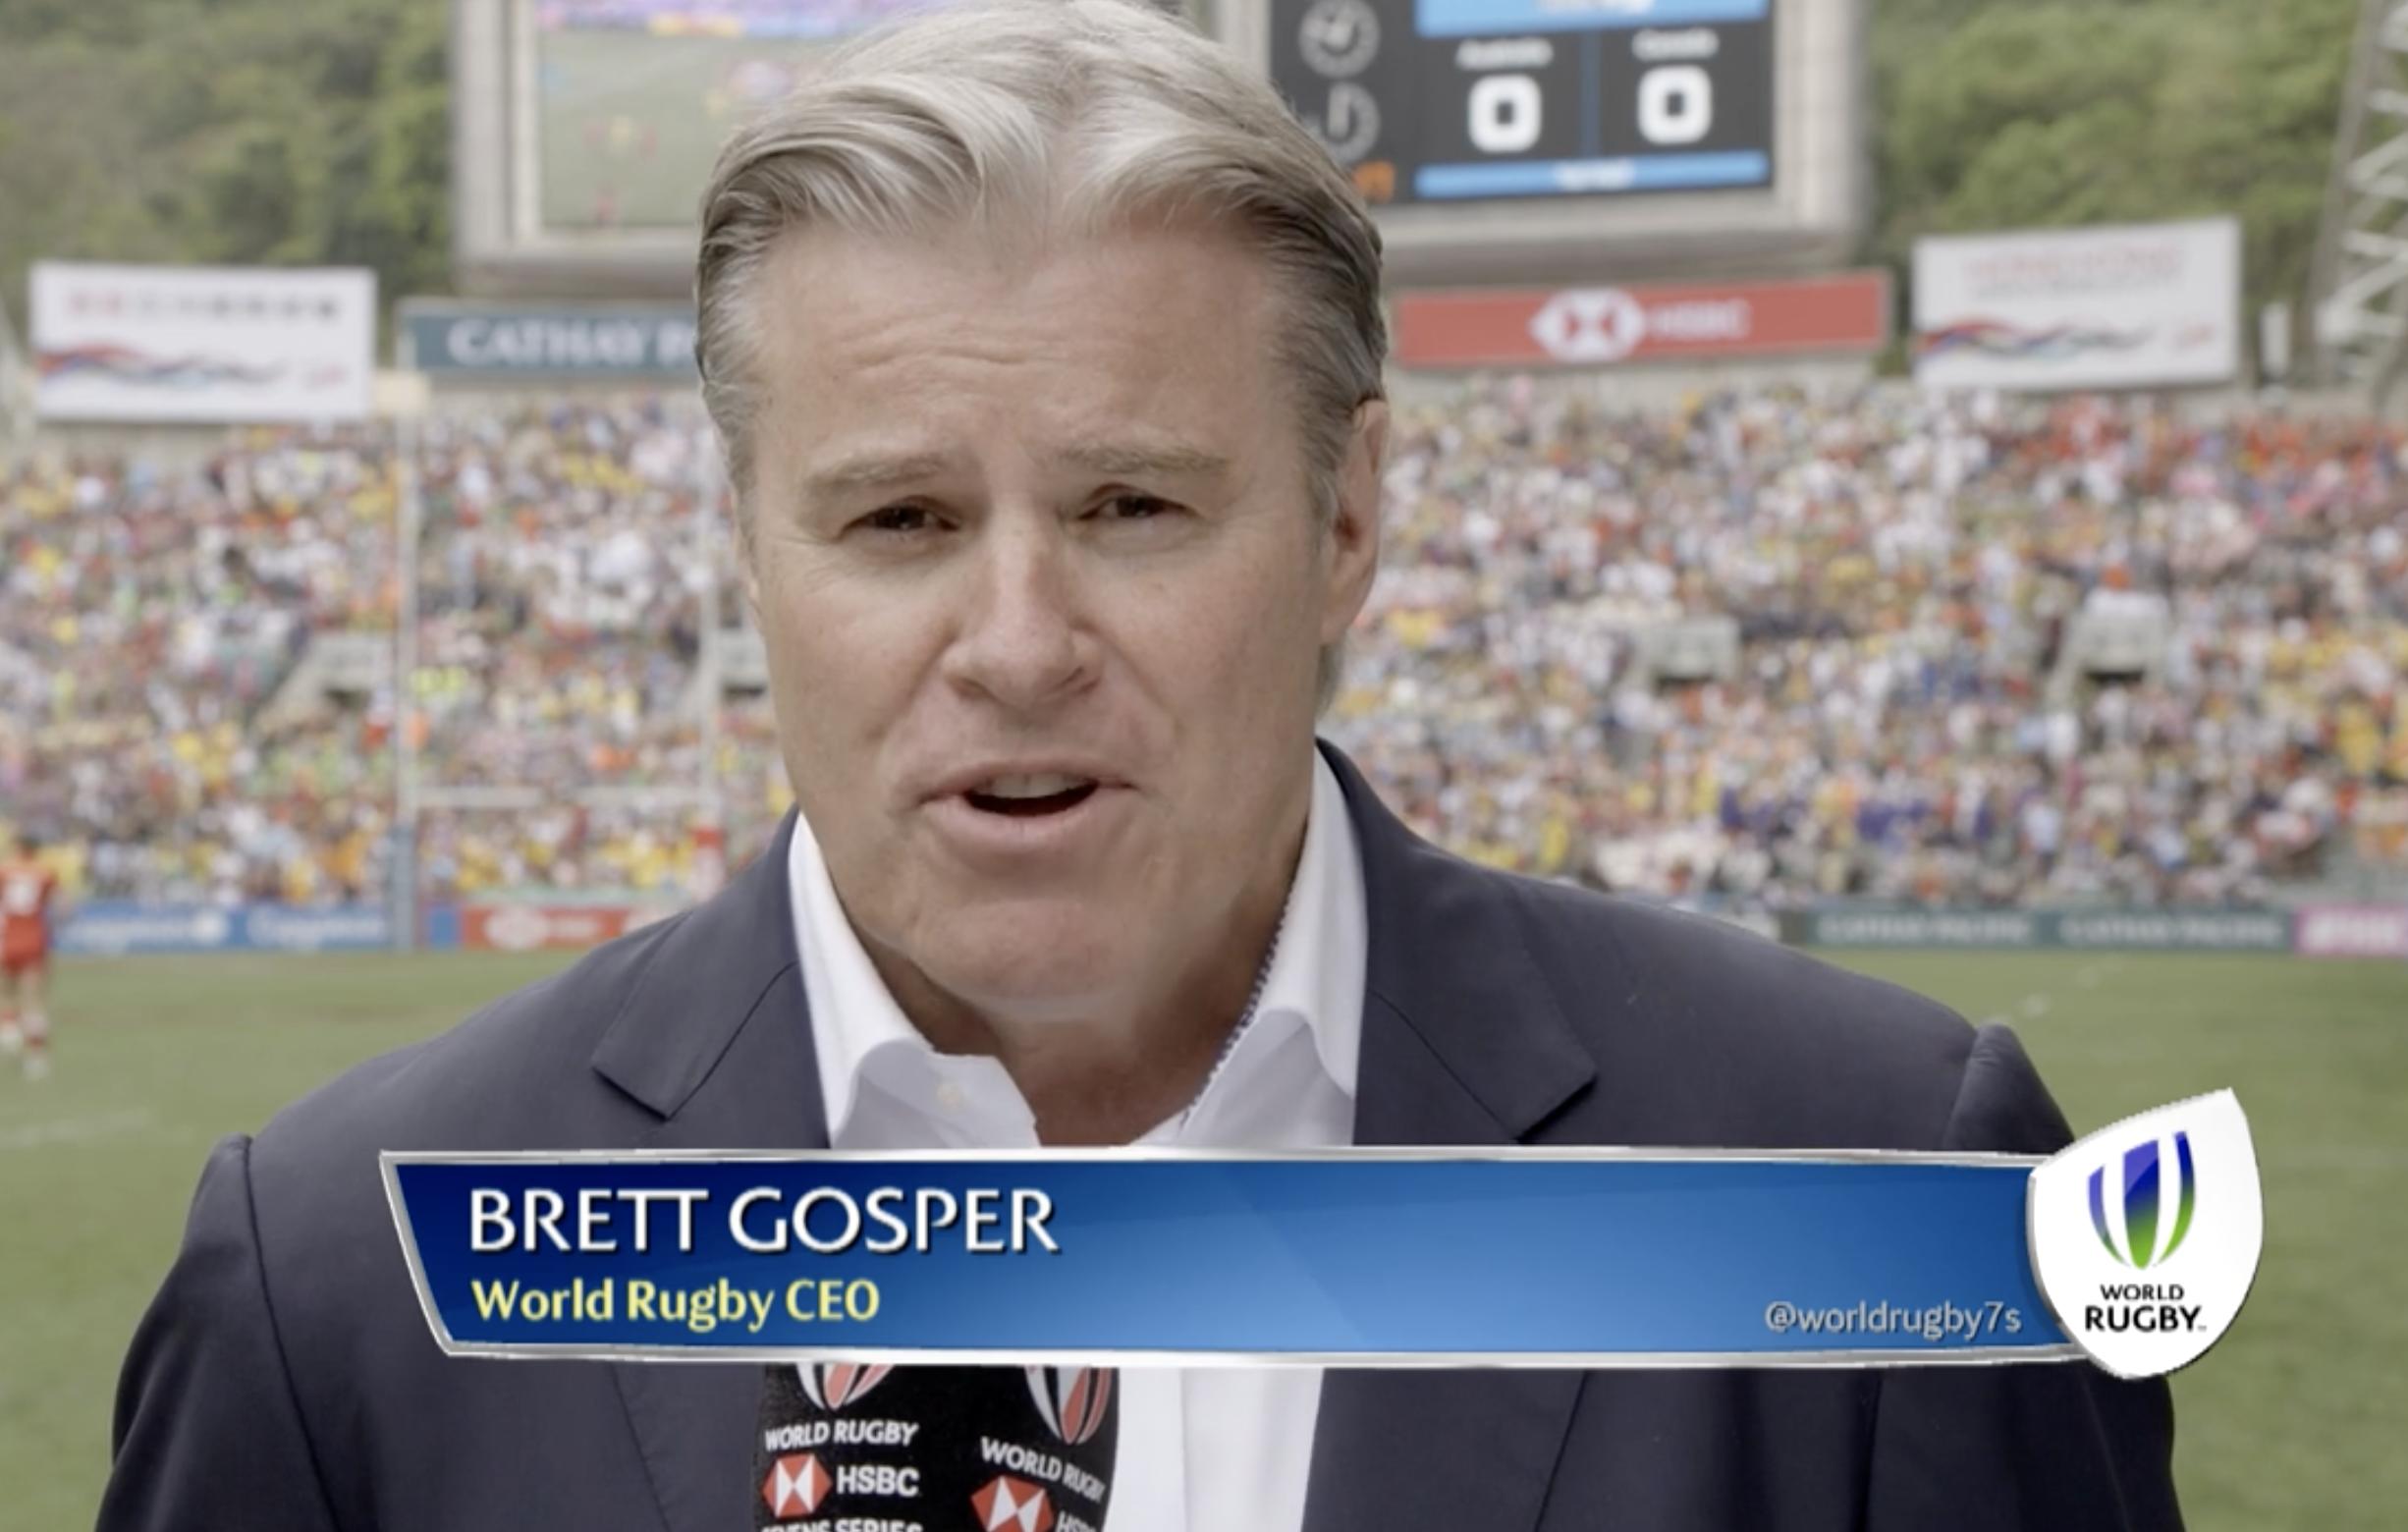 100 Days To Go: Brett Gosper looking forward to groundbreaking